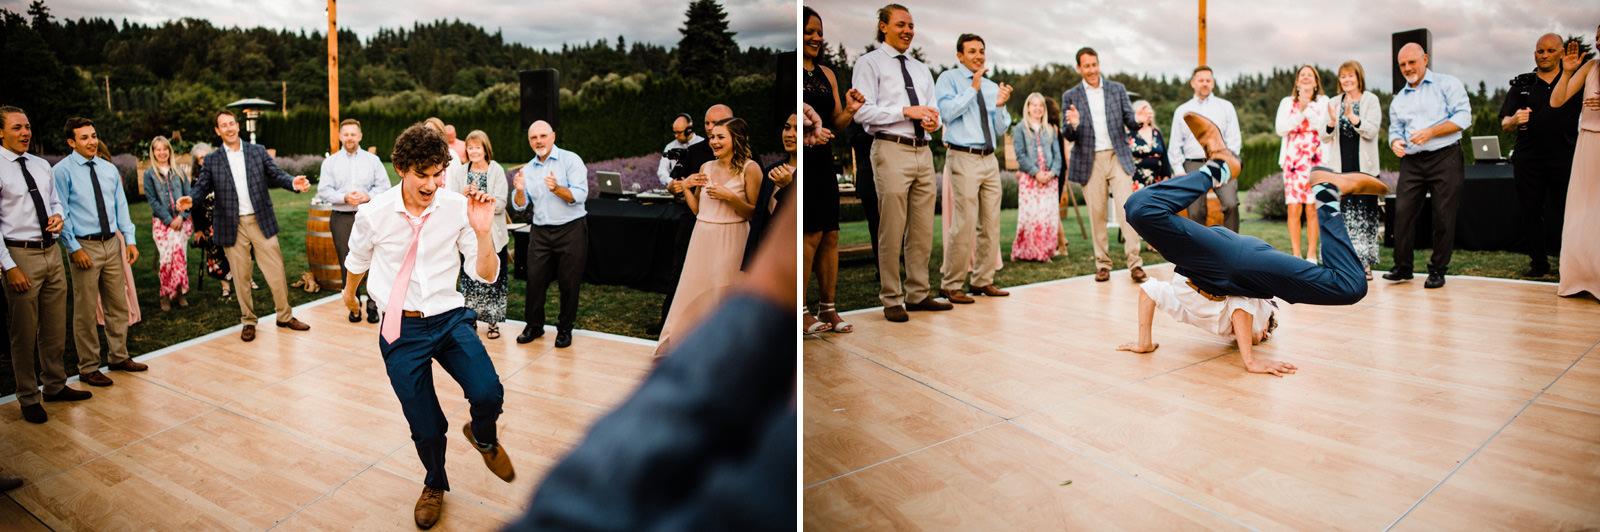 110-woodinville-lavendar-farm-wedding-with-golden-glowy-photos.jpg